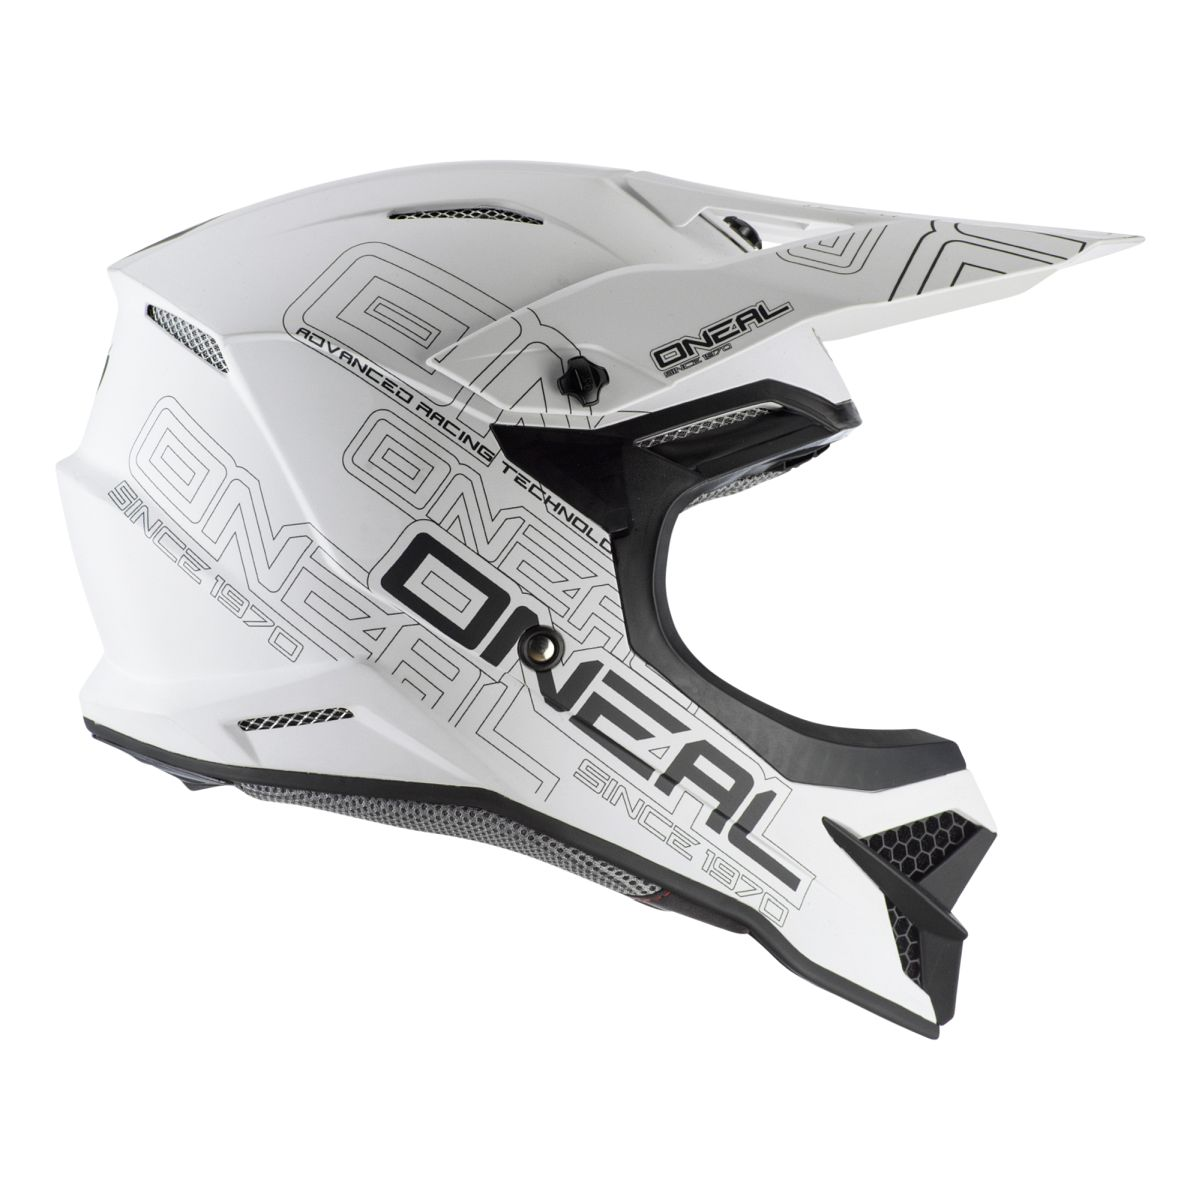 Gr/ö/ße 61-62cm XL ONeal 3 Series Flat 2.0 Motocross Enduro MTB Helm wei/ß 2020 Oneal